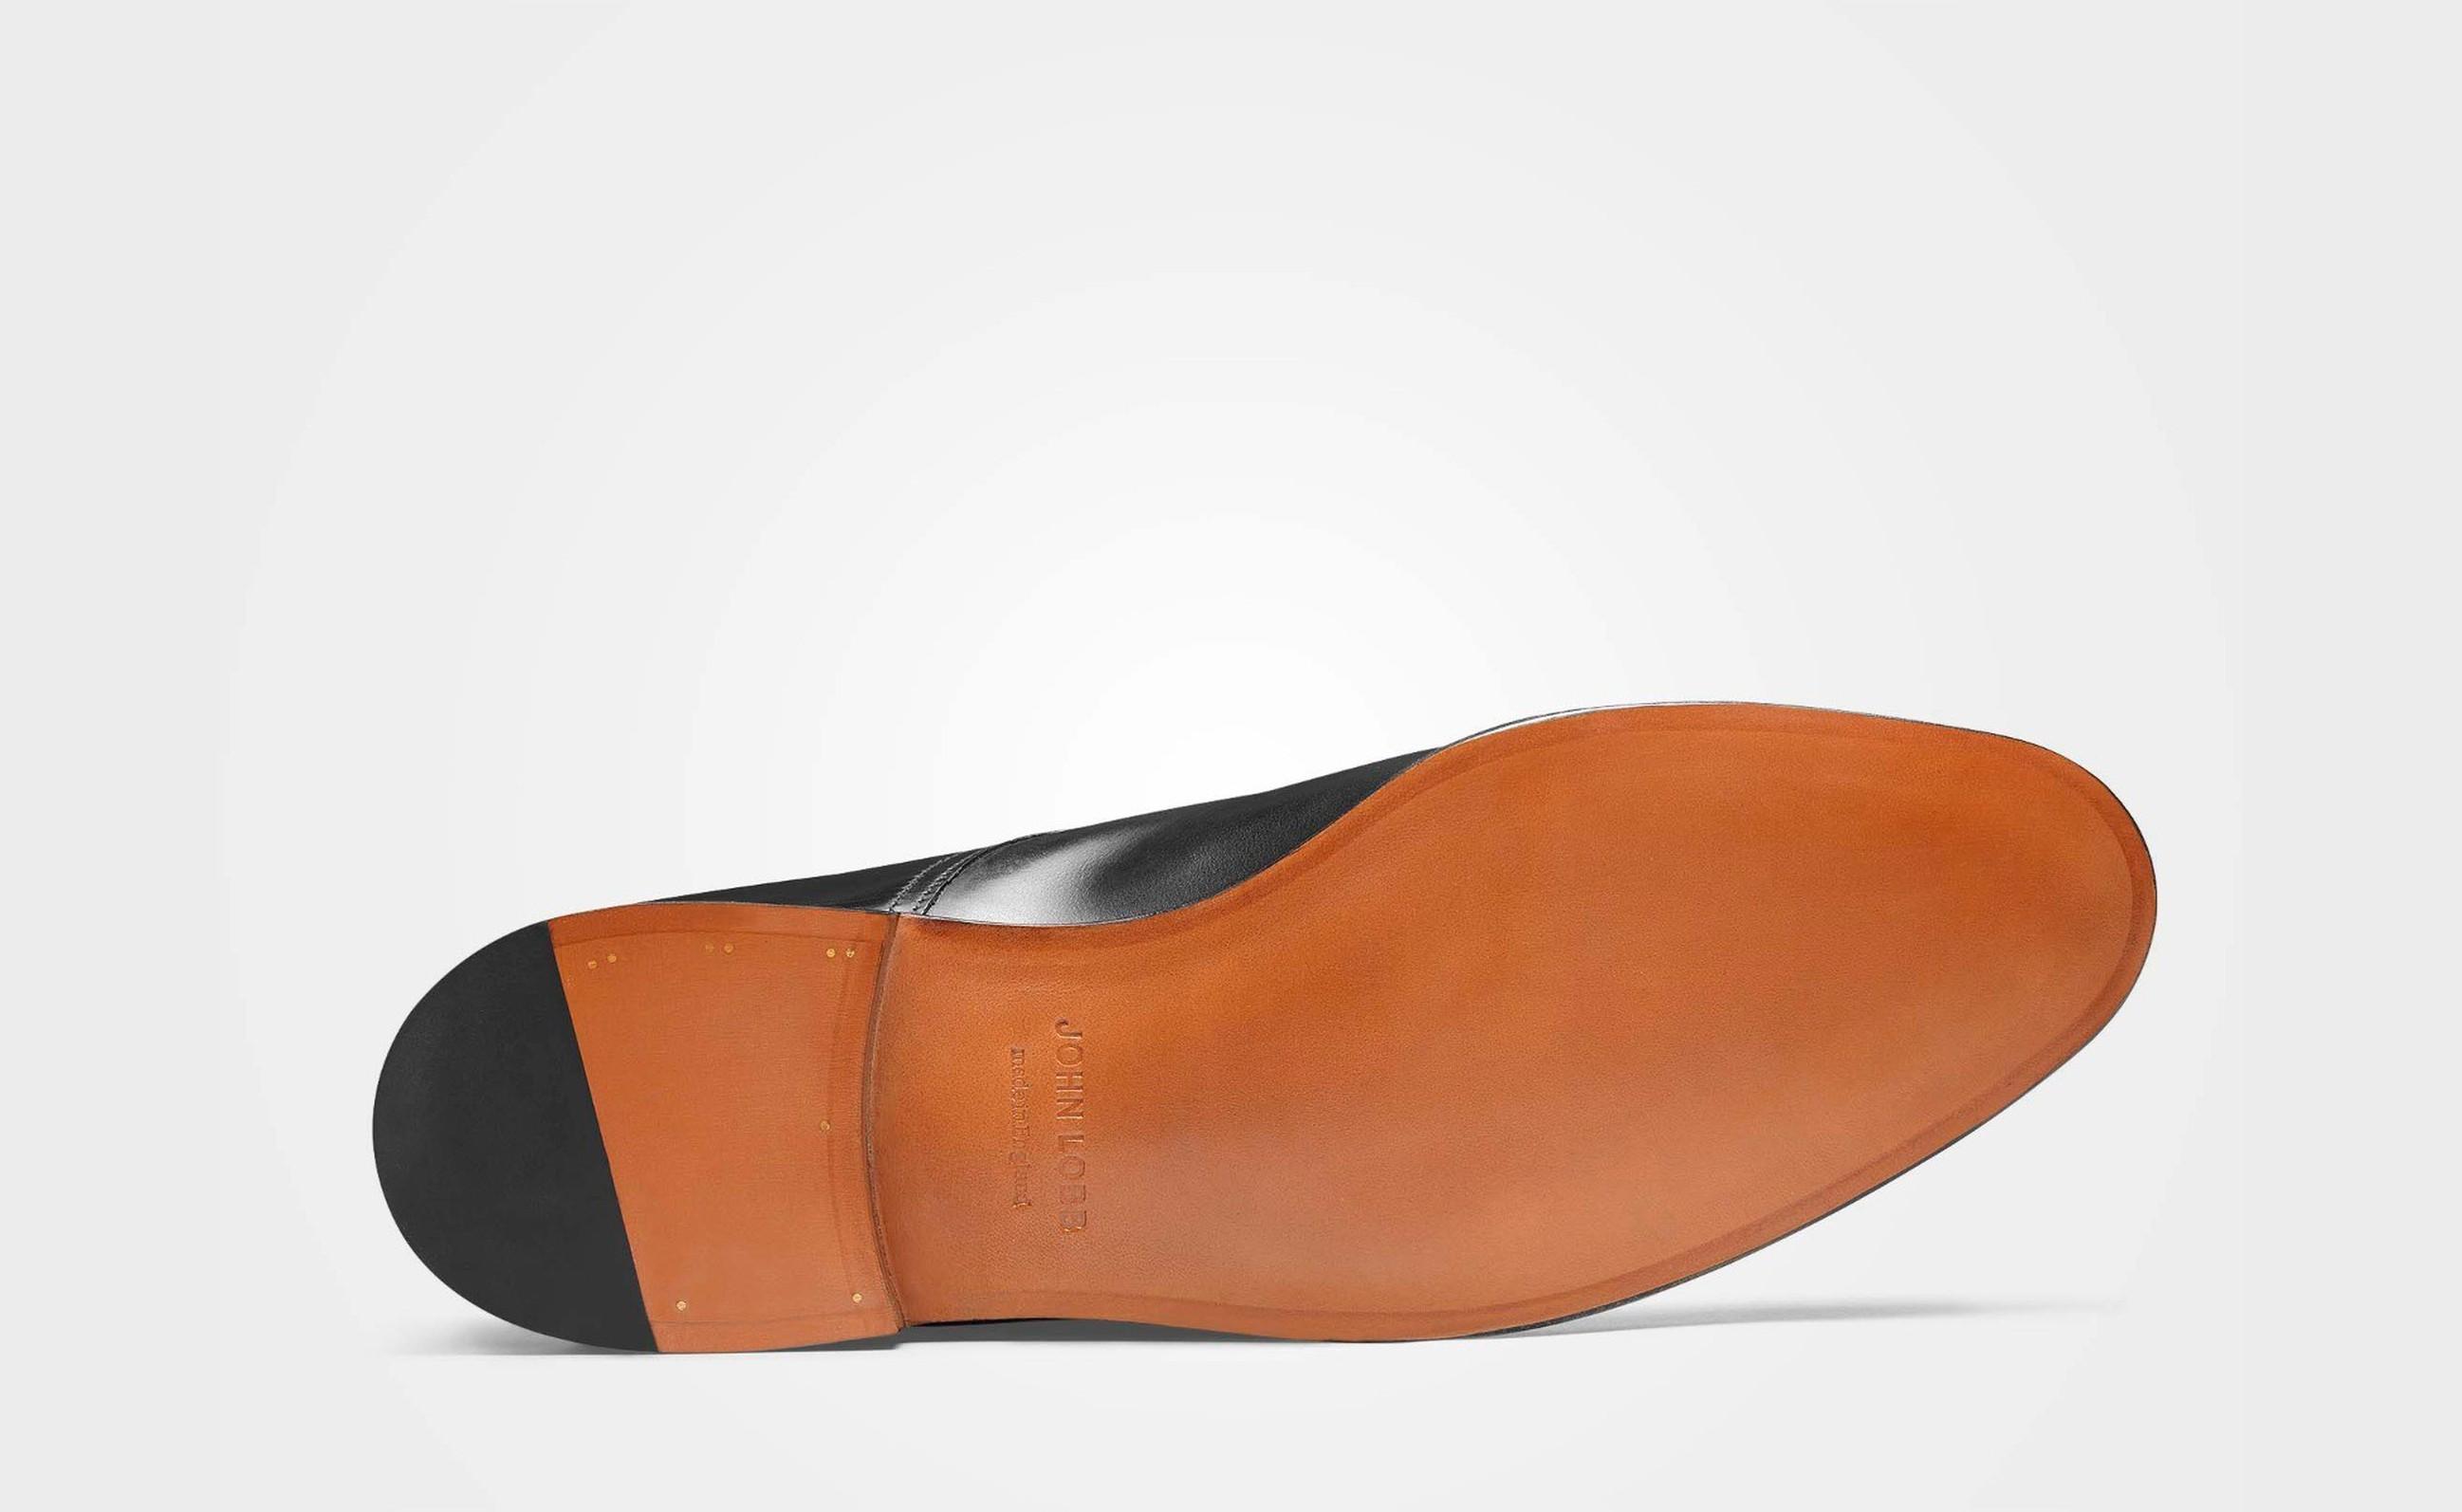 https://thumbor-gc.tomandco.uk/unsafe/trim/fit-in/2595x1594/center/middle/smart/filters:upscale():fill(ececec):sharpen(0)/https://www.johnlobb.com/static/media/catalog/product/1/6/166181le1r_cleve_black-museum-calf_sole_2.jpg